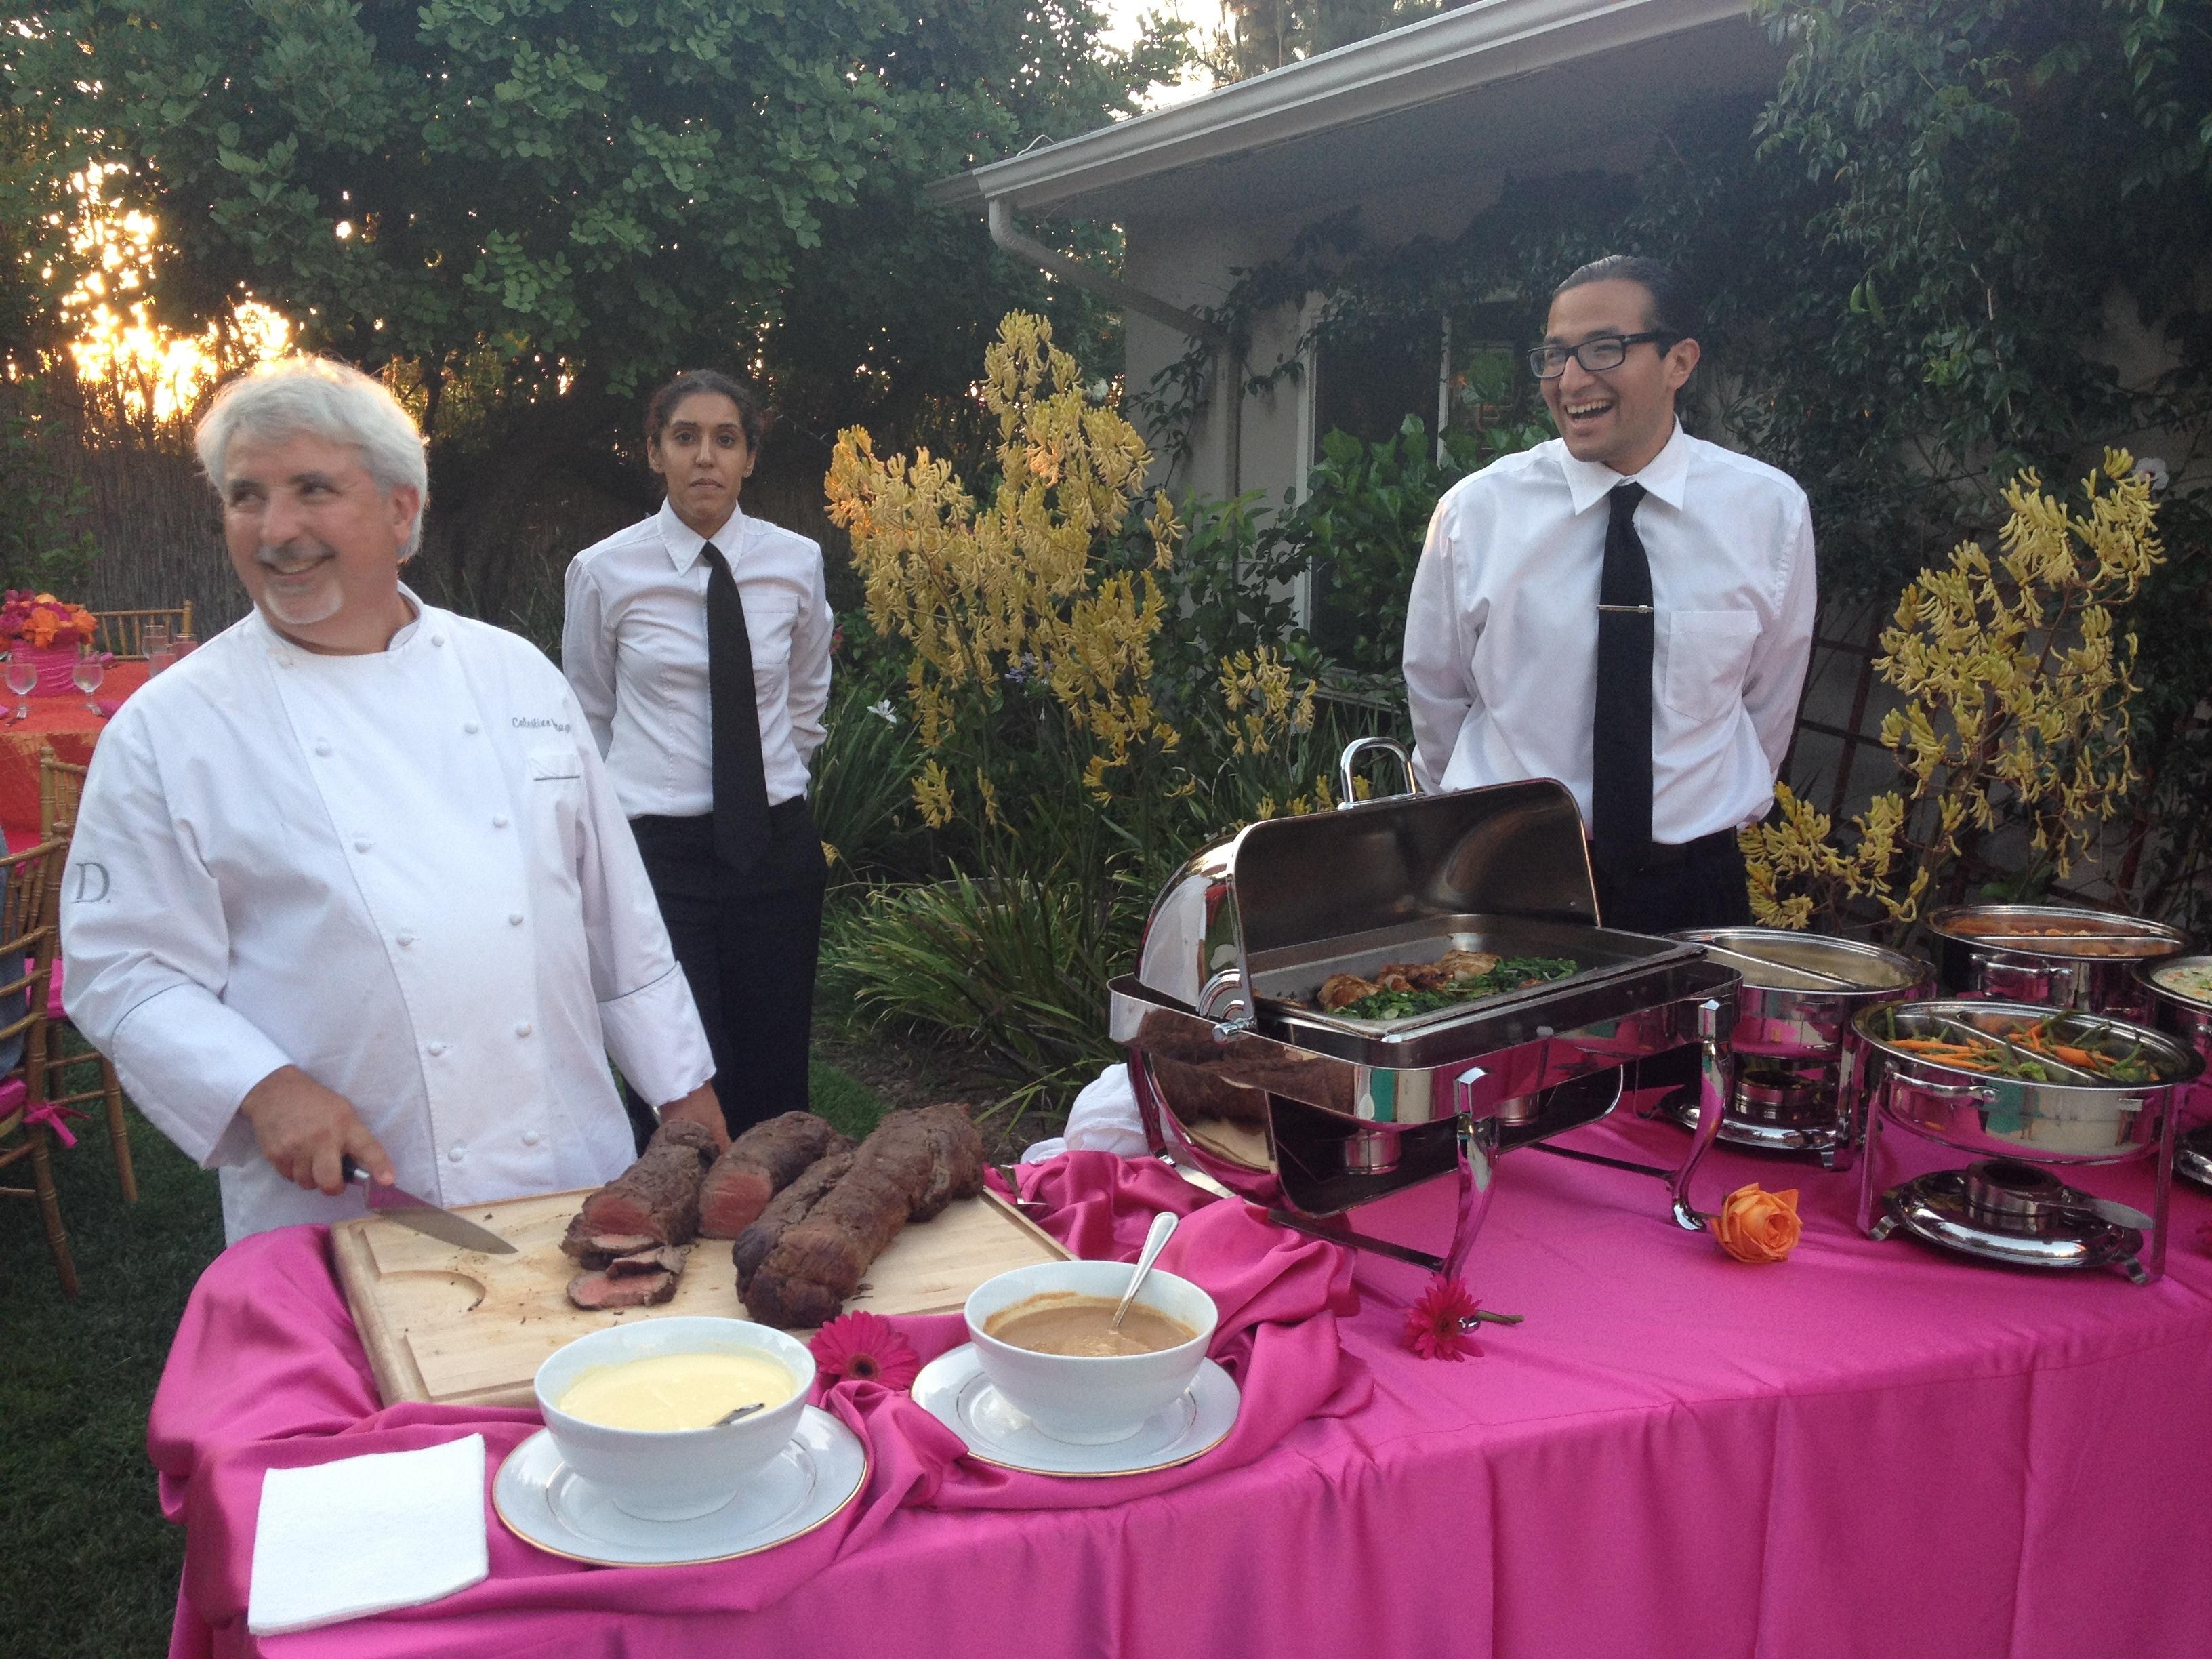 Celebrity Chef Celestino Drago